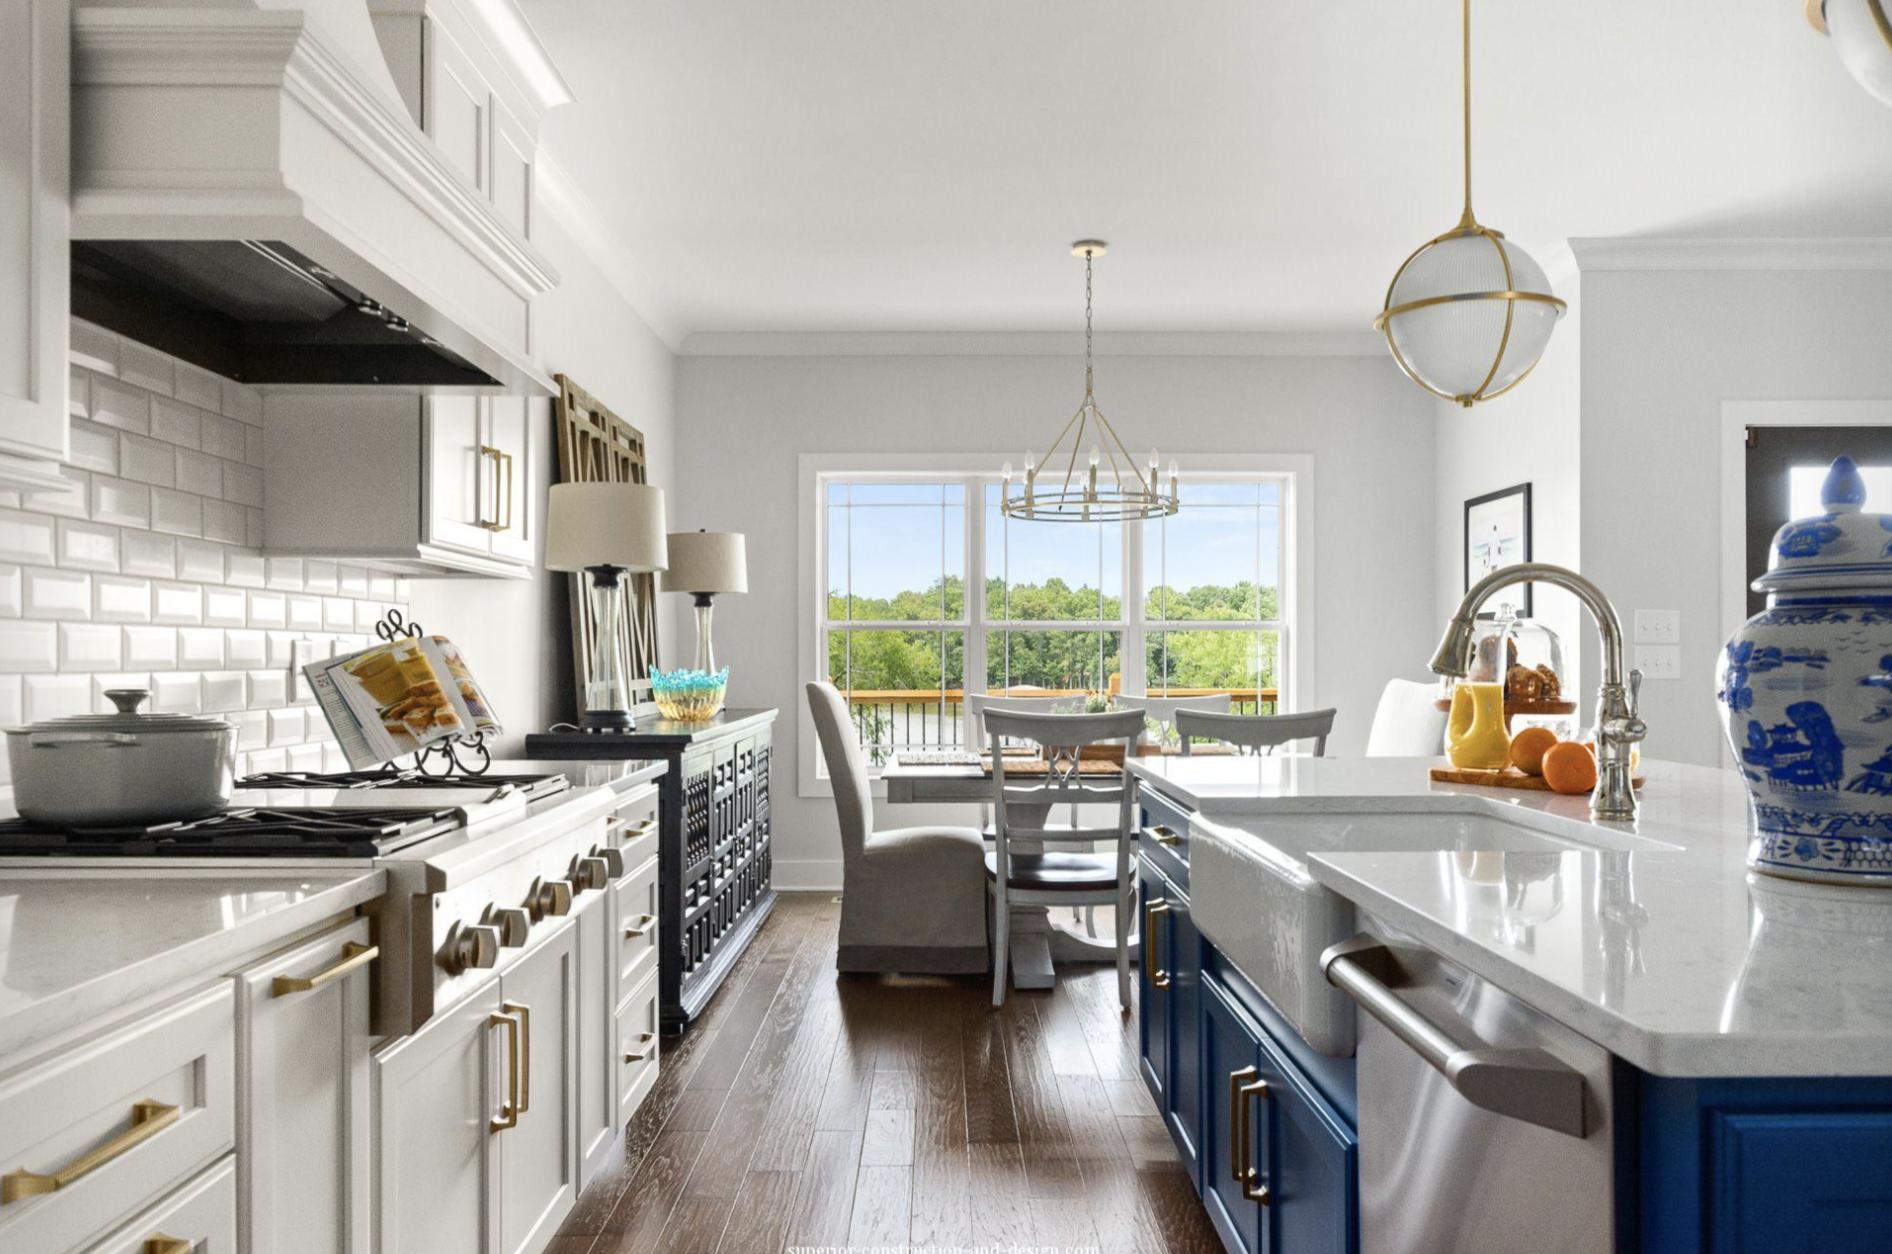 superior-construction-lebanon-tn-common-design-mistakes-kitchen-with-gold-hardware-blue-cabinet-island